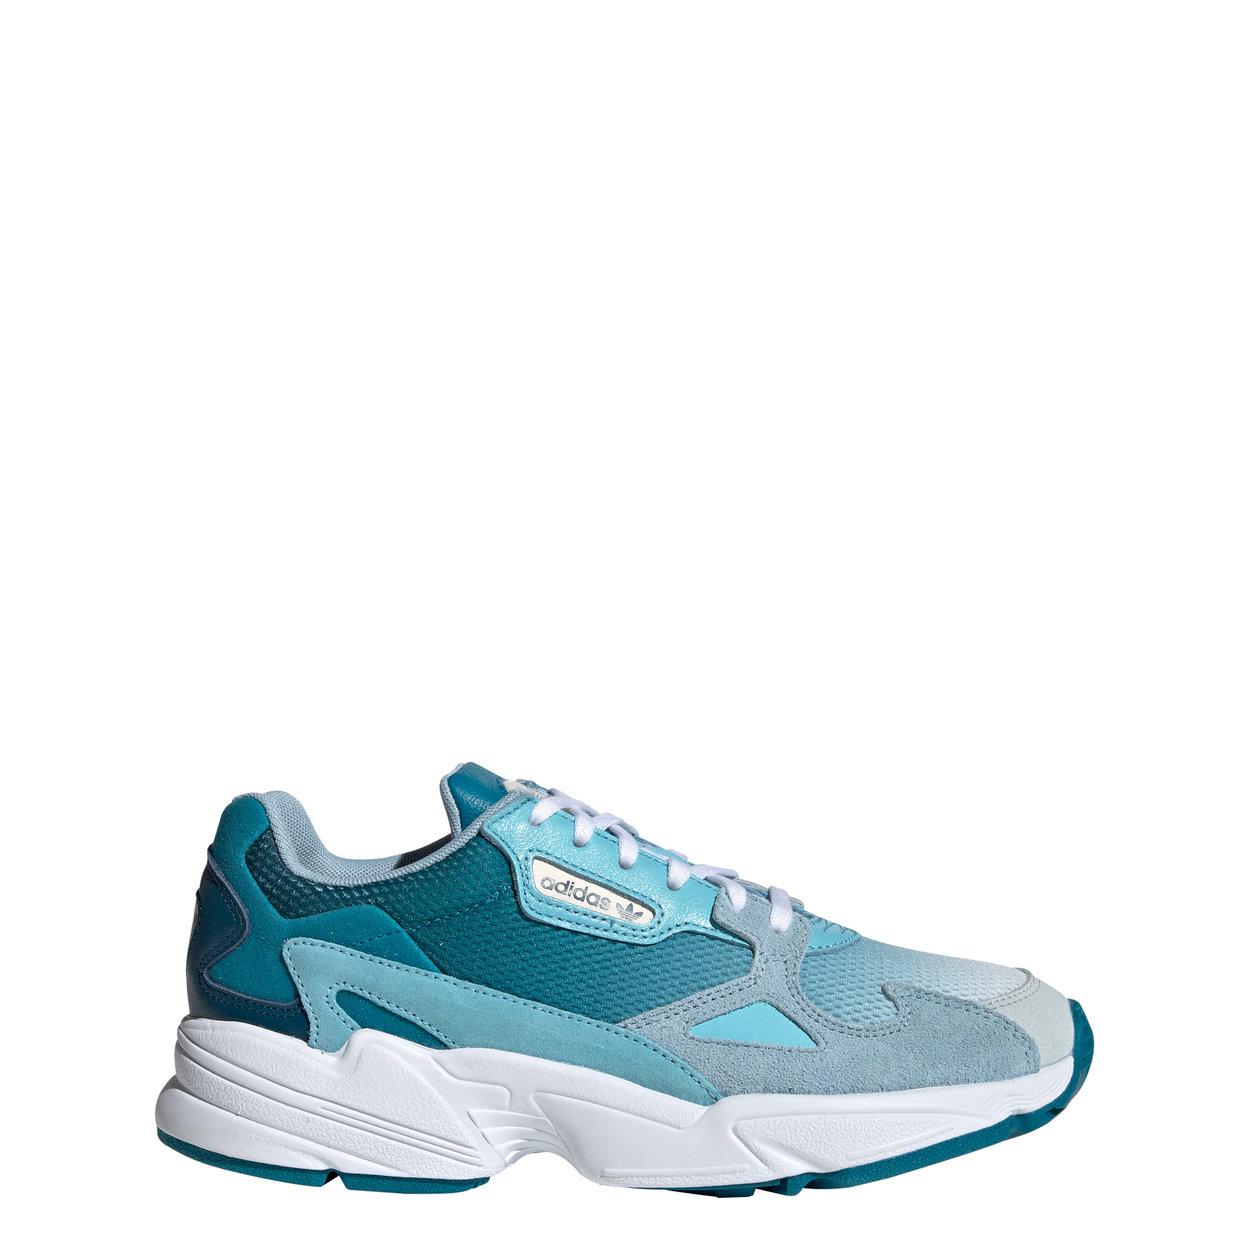 Image of Sneaker Falcon azzure/blu sfumate